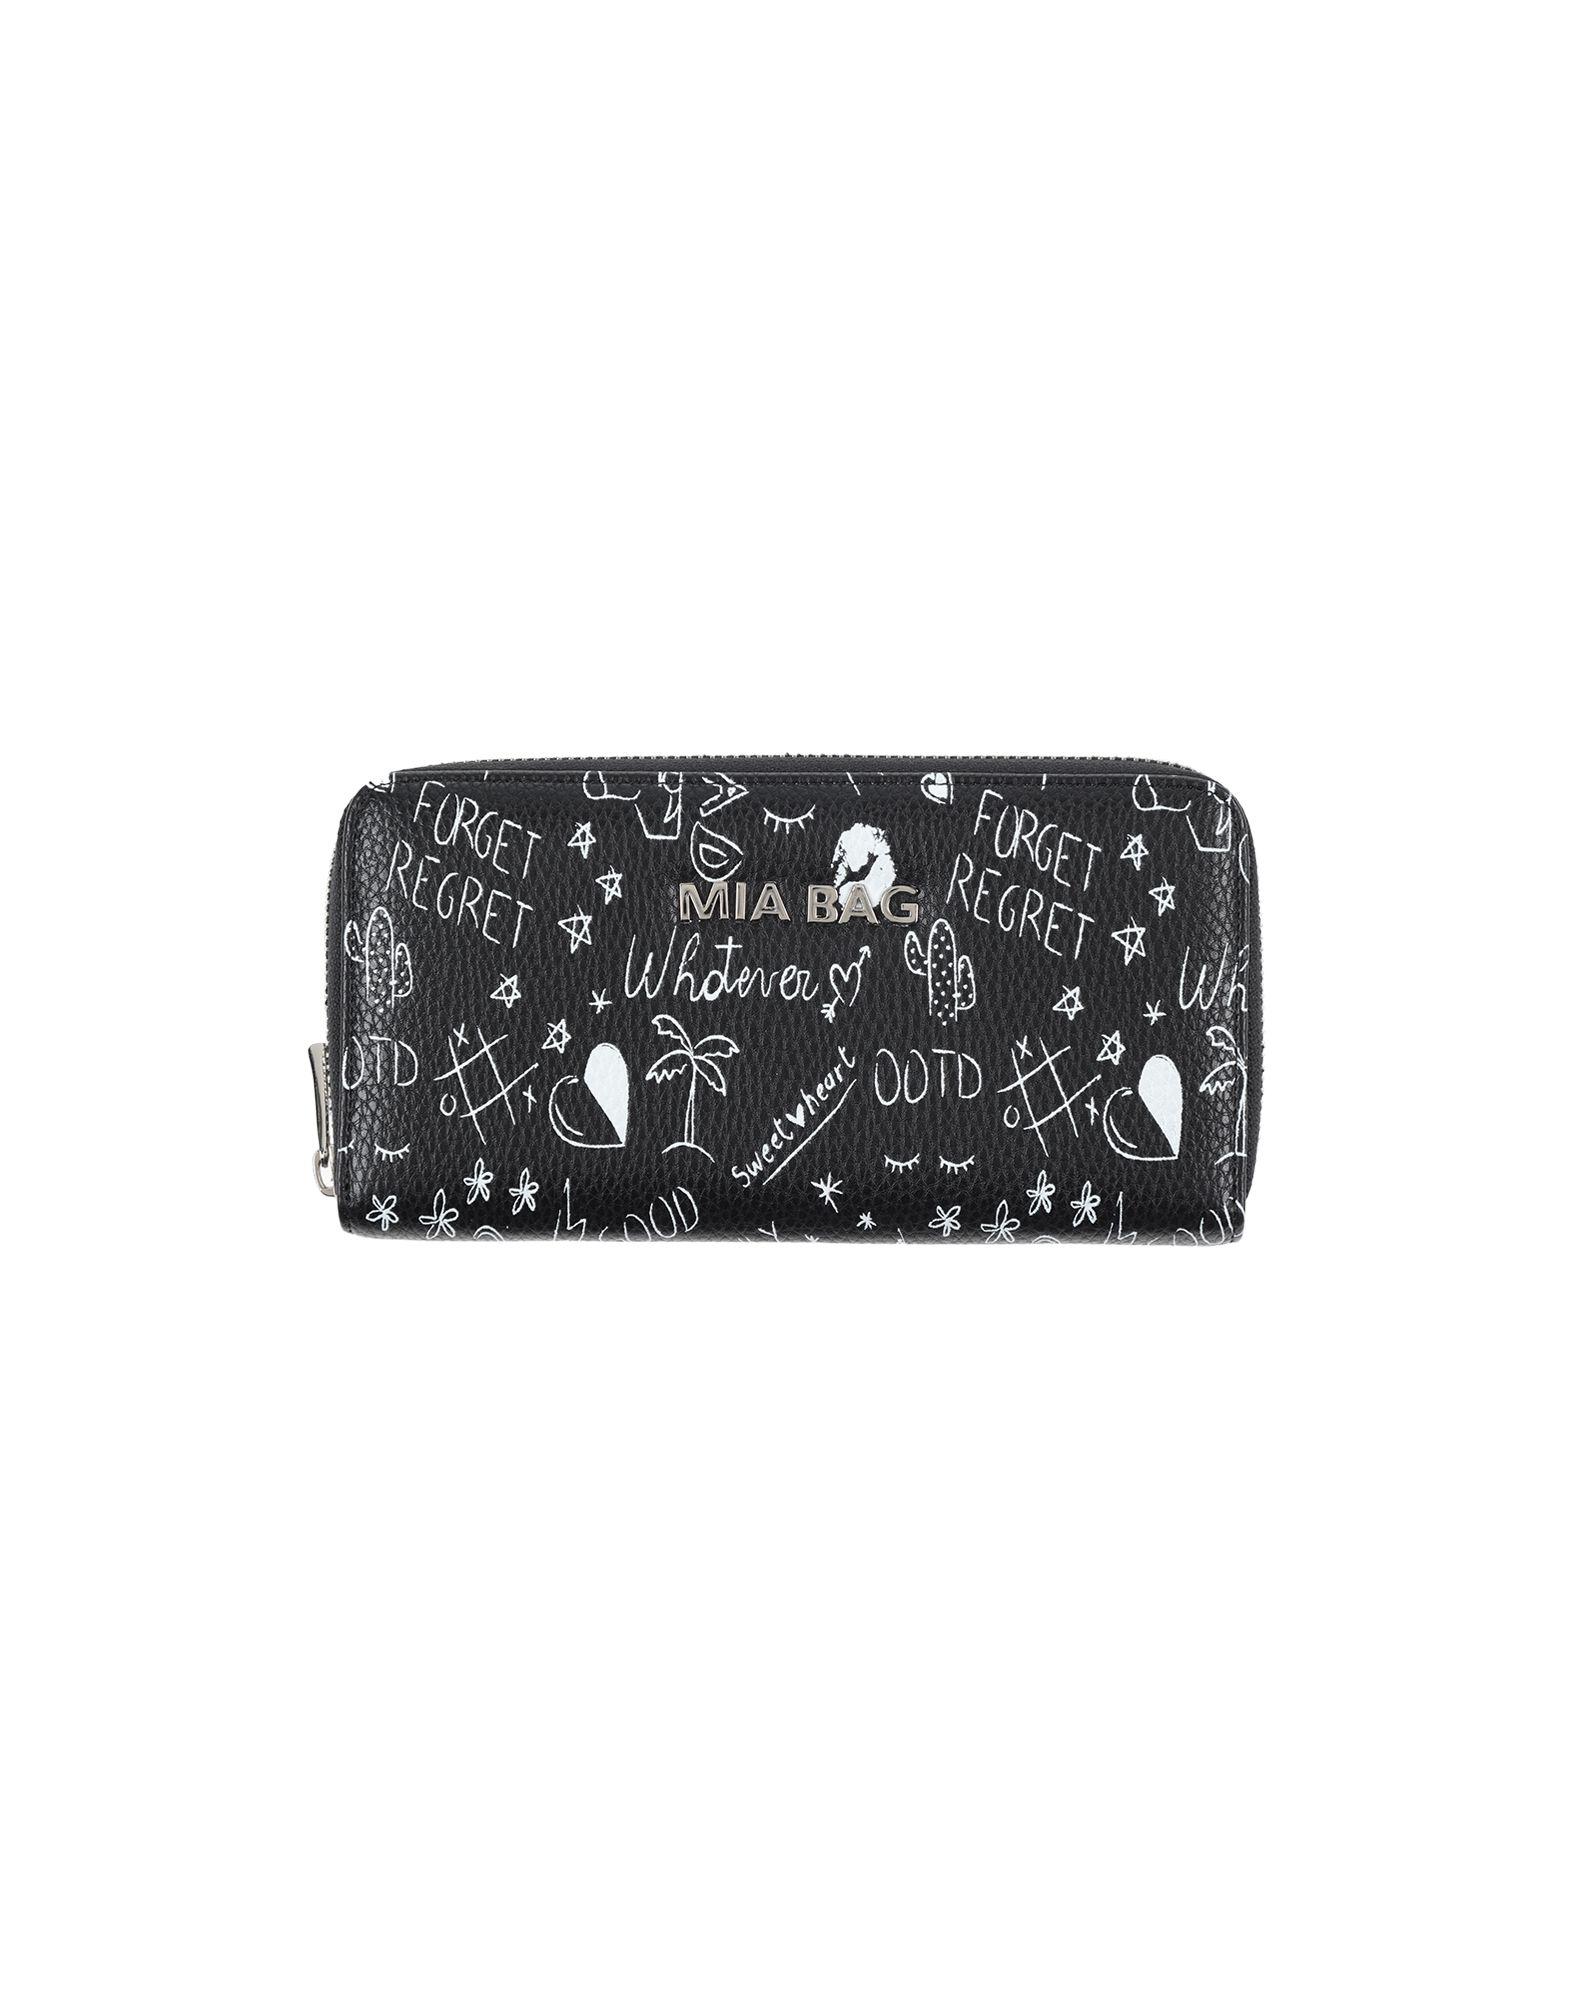 Фото - MIA BAG Бумажник cow leather tote bag brand 2018 bolsa feminina new women handbag 100% genuine leather alligator shoulder bag free shipping